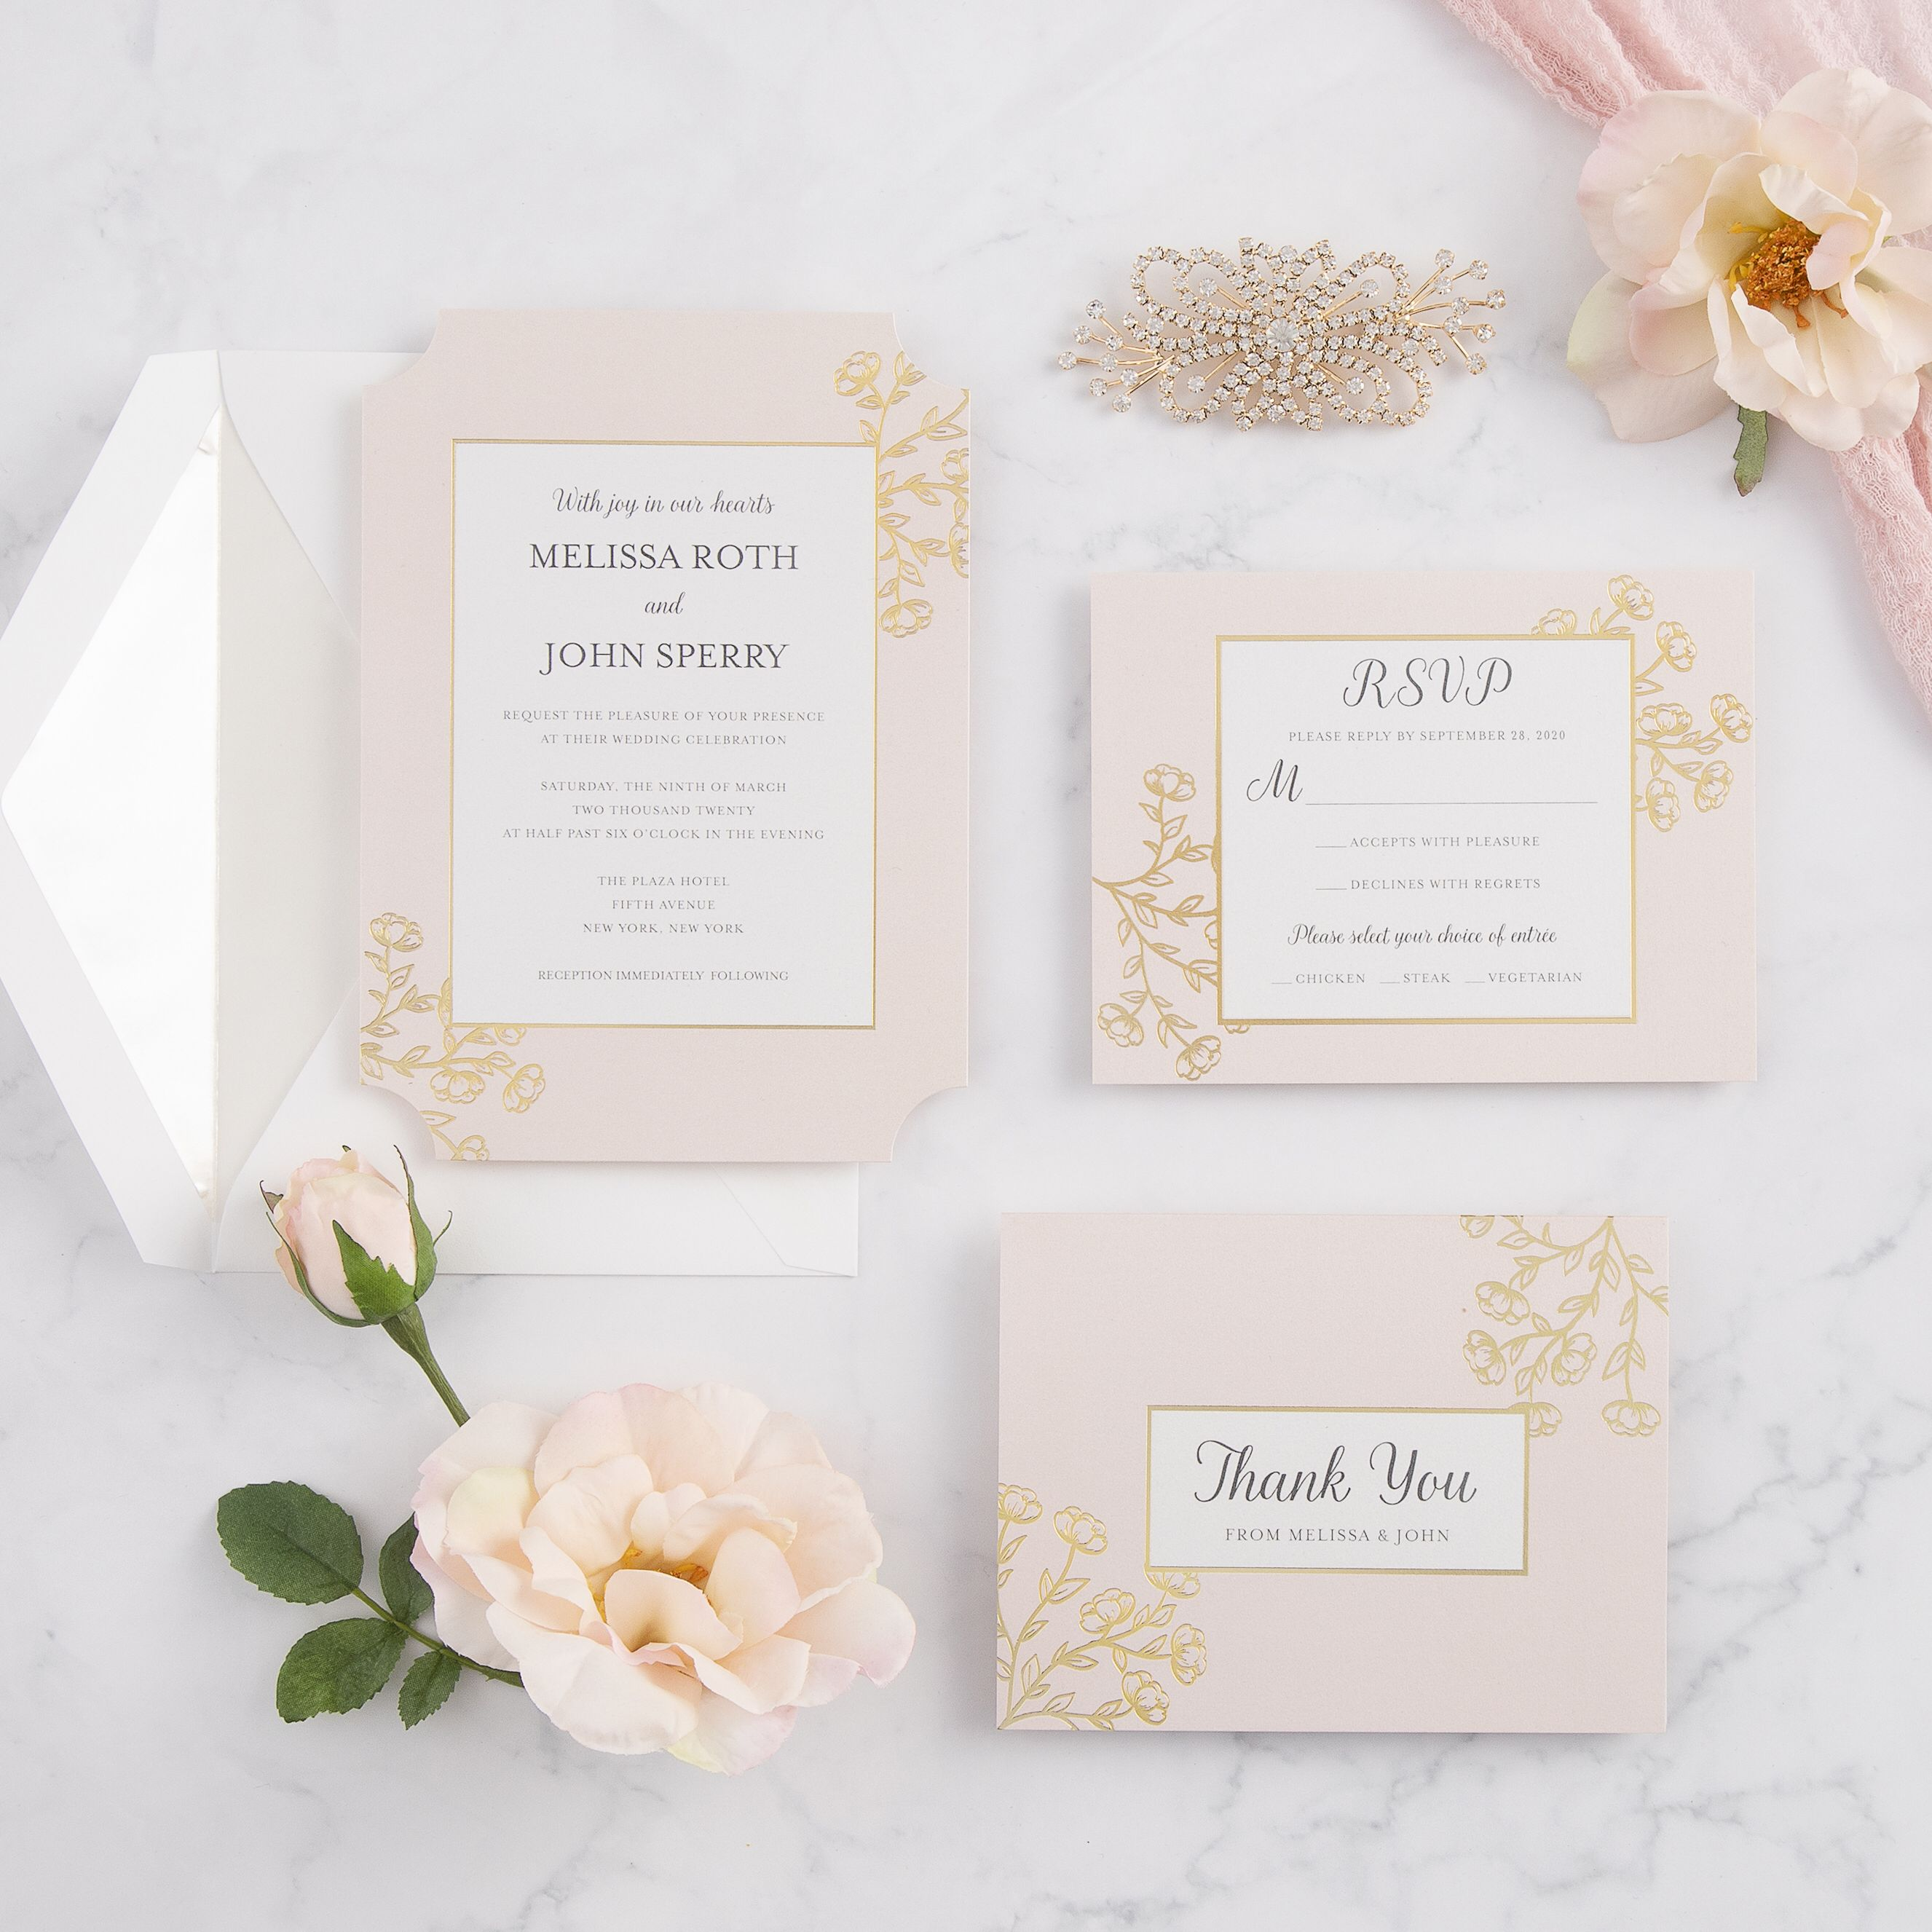 Classic Signature Wedding Invitations By David Tutera Wedding Invitations Wedding Invitation Kits Fun Wedding Invitations